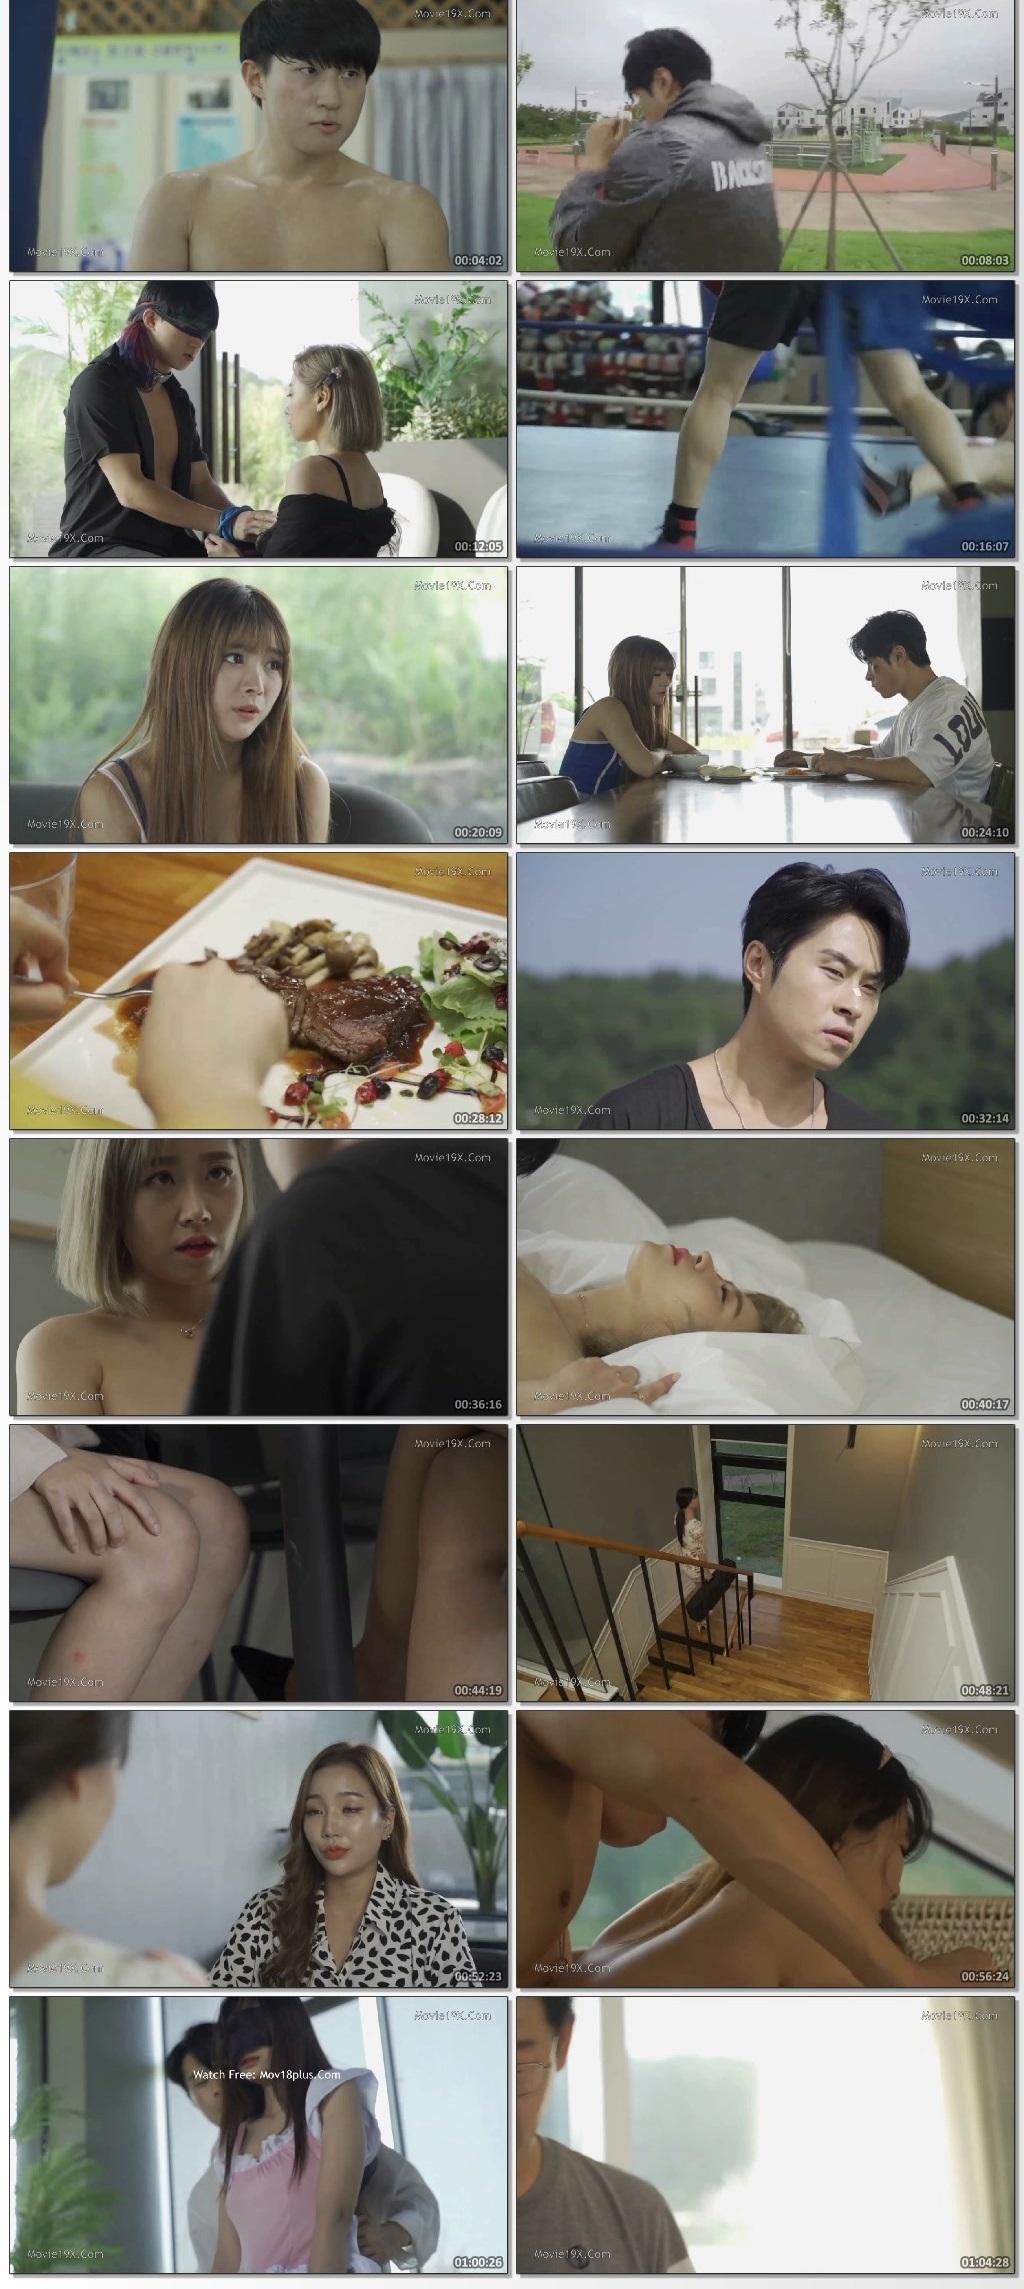 Dangerous-Relationship-Professor-and-University-Student-2021-www-filmguro-site-Korean-Movie-720p-HDR